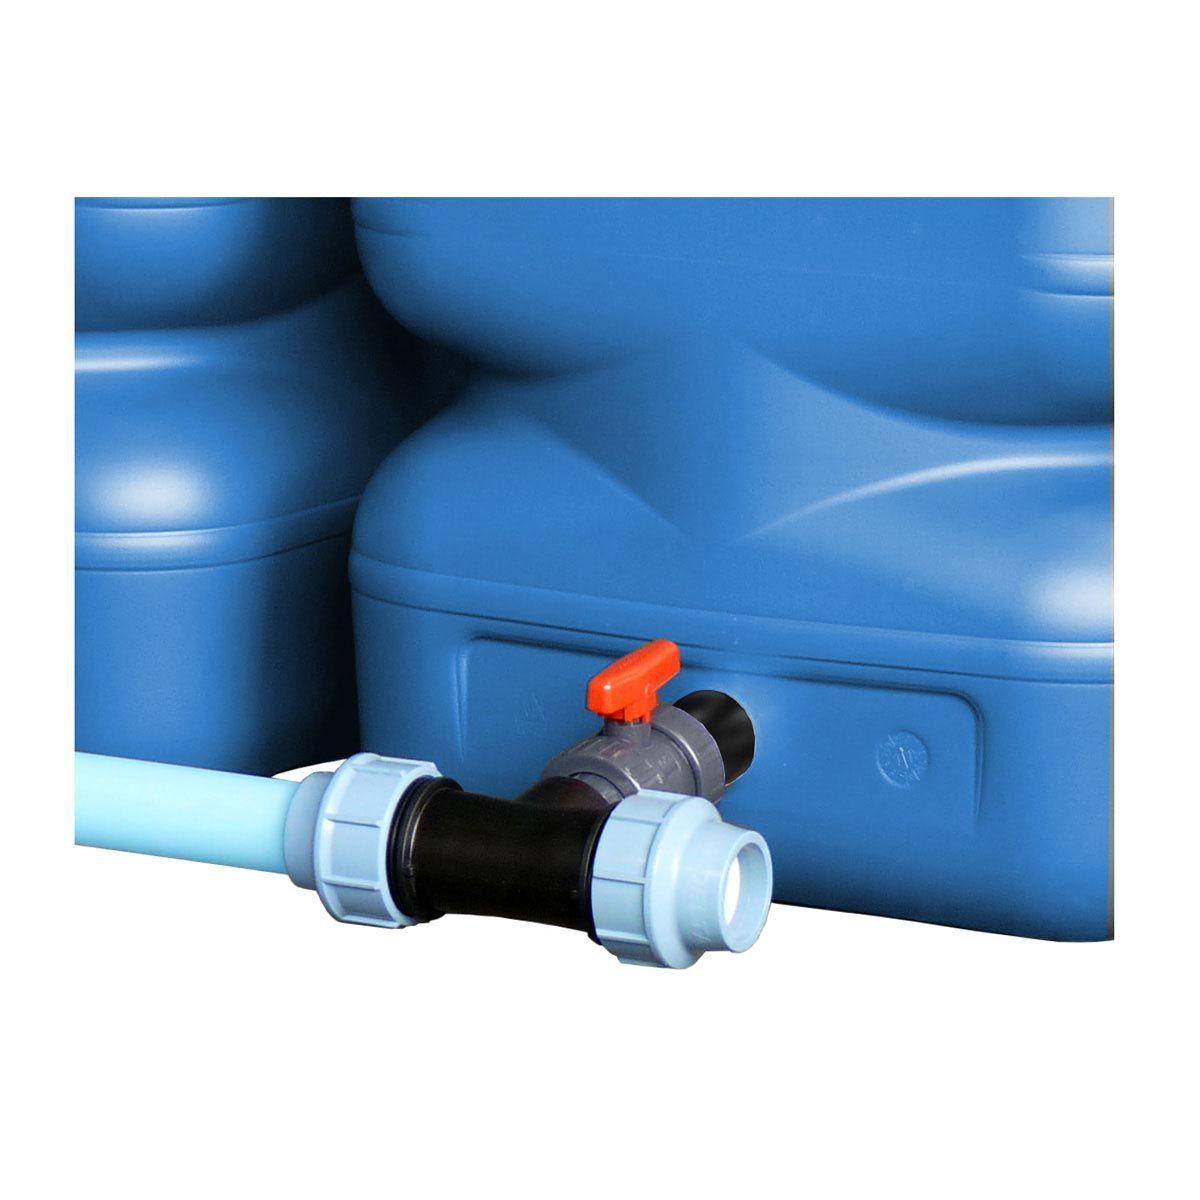 Erweiterungs-Verbindungs-Set DN 50, inkl. PVC Hahn, PE Rohr, PP Fitting, 1 1/2', DN 50